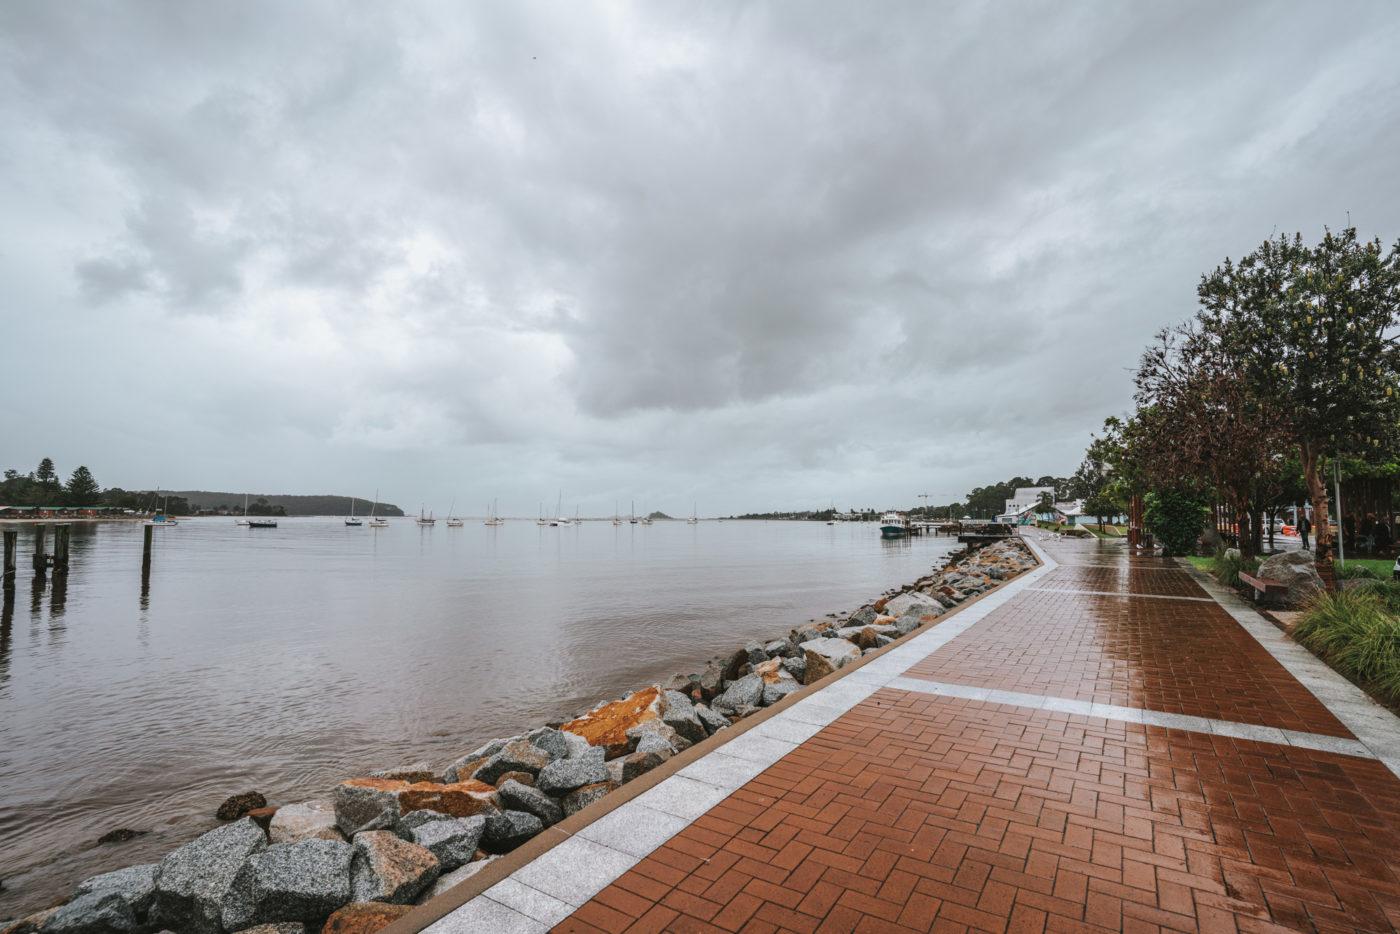 Bateman's Bay, Eurobodalla, NSW, Sydney to Melbourne drive